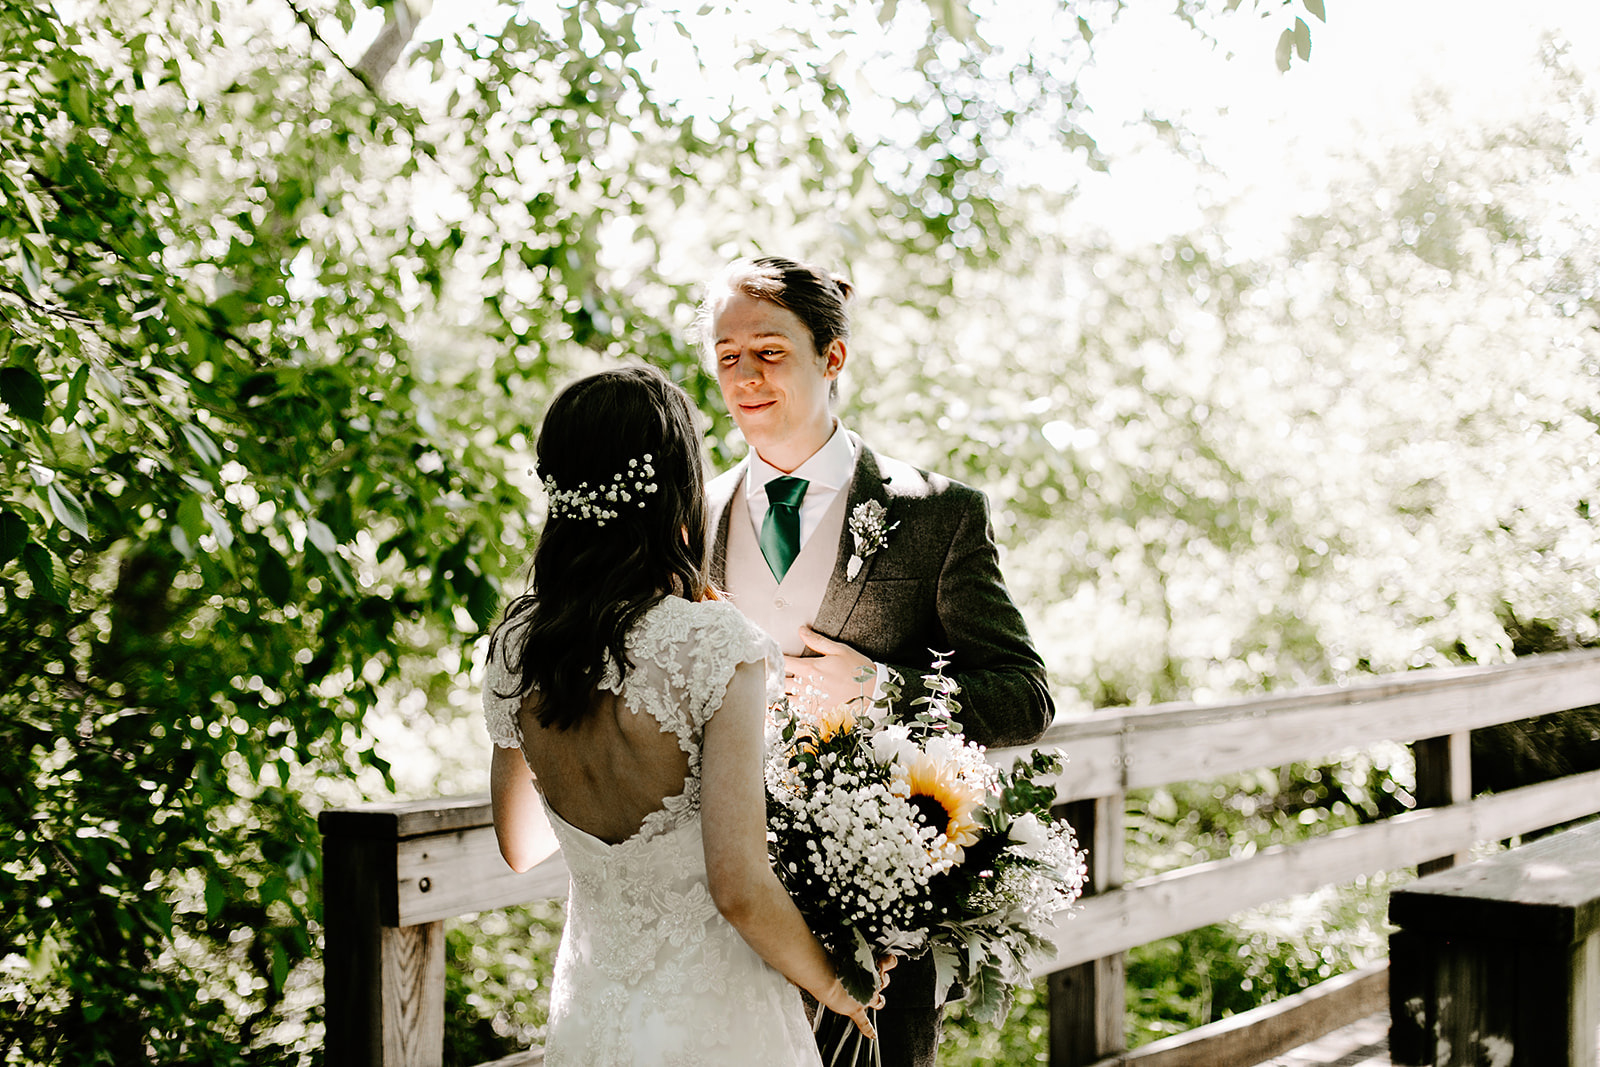 Lily and Easton Wedding Carmel Indiana Cool Creek Park Grace Church Emily Elyse Wehner Photography -65.jpg